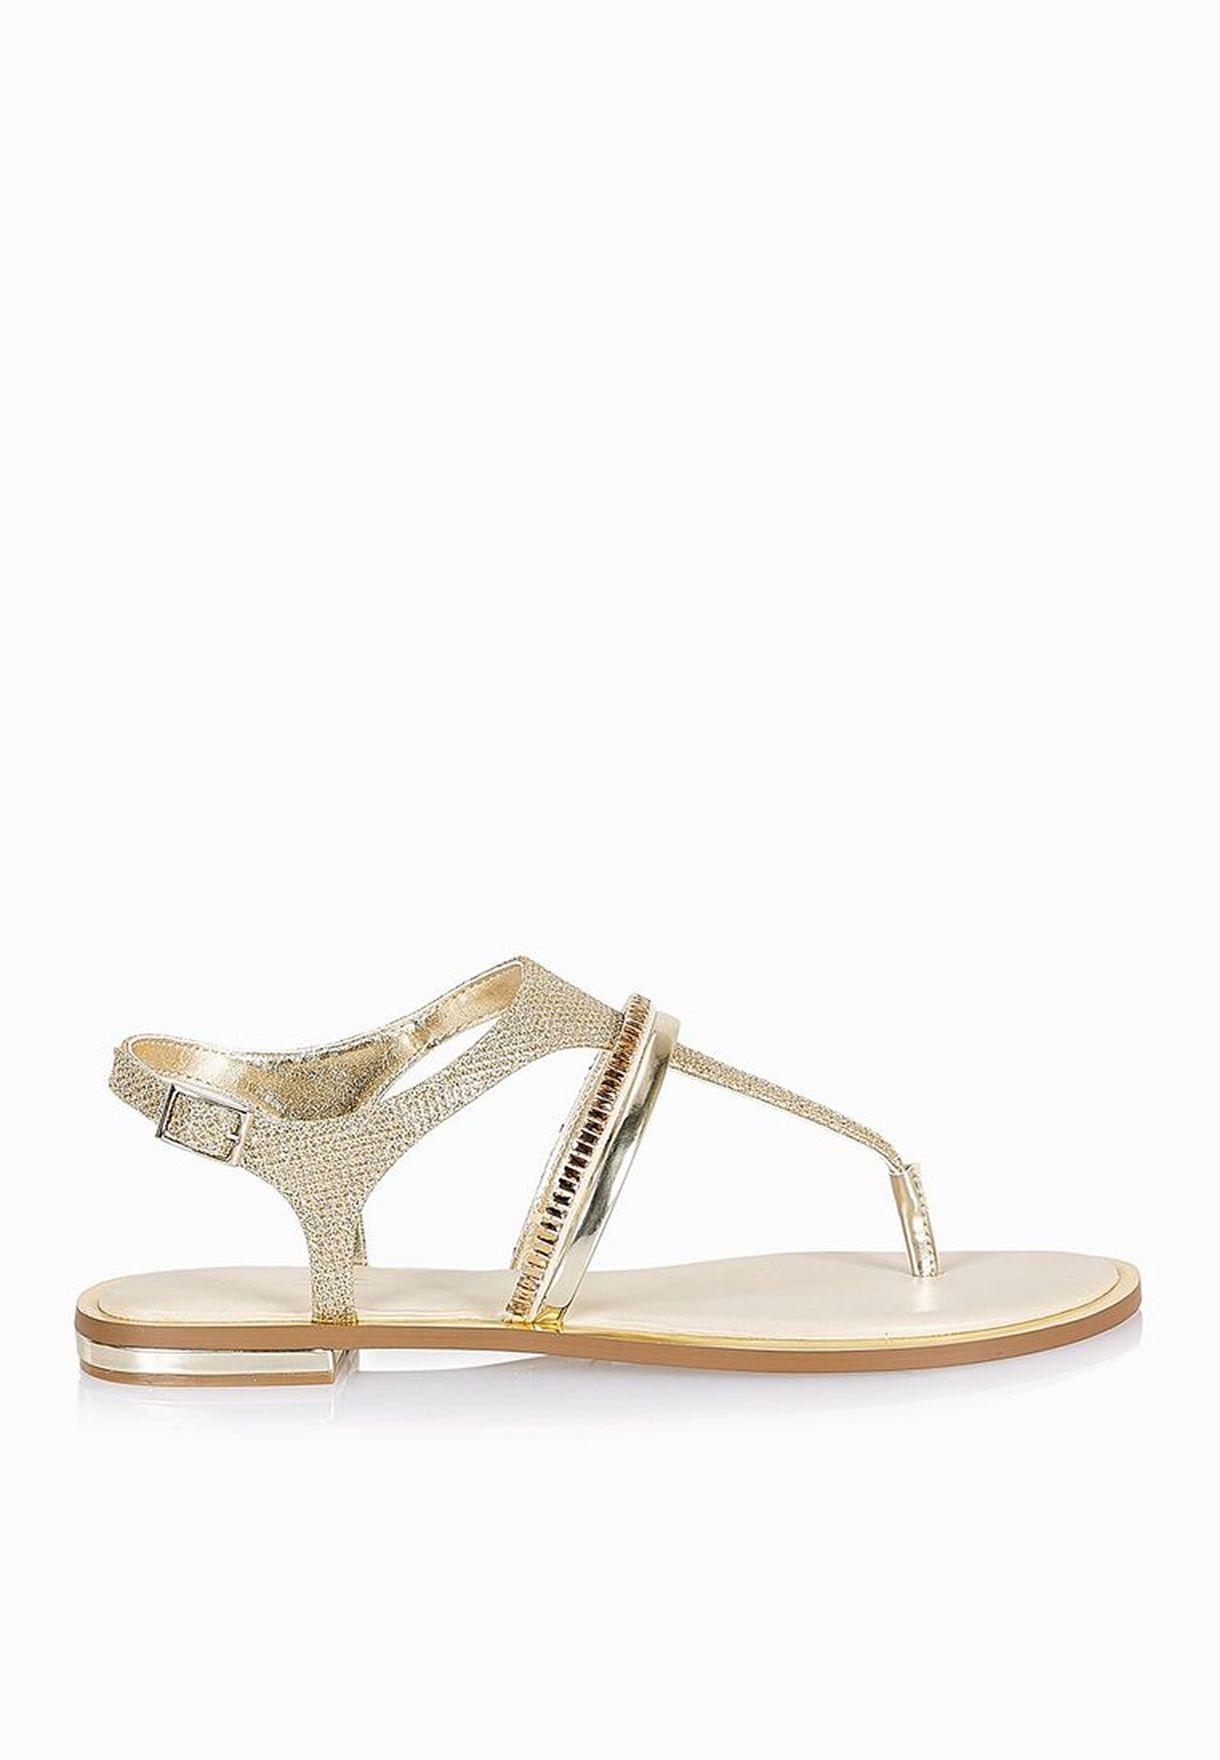 838d26562 Shop Aldo gold Olivetta T Bar Thong Sandals for Women in UAE ...